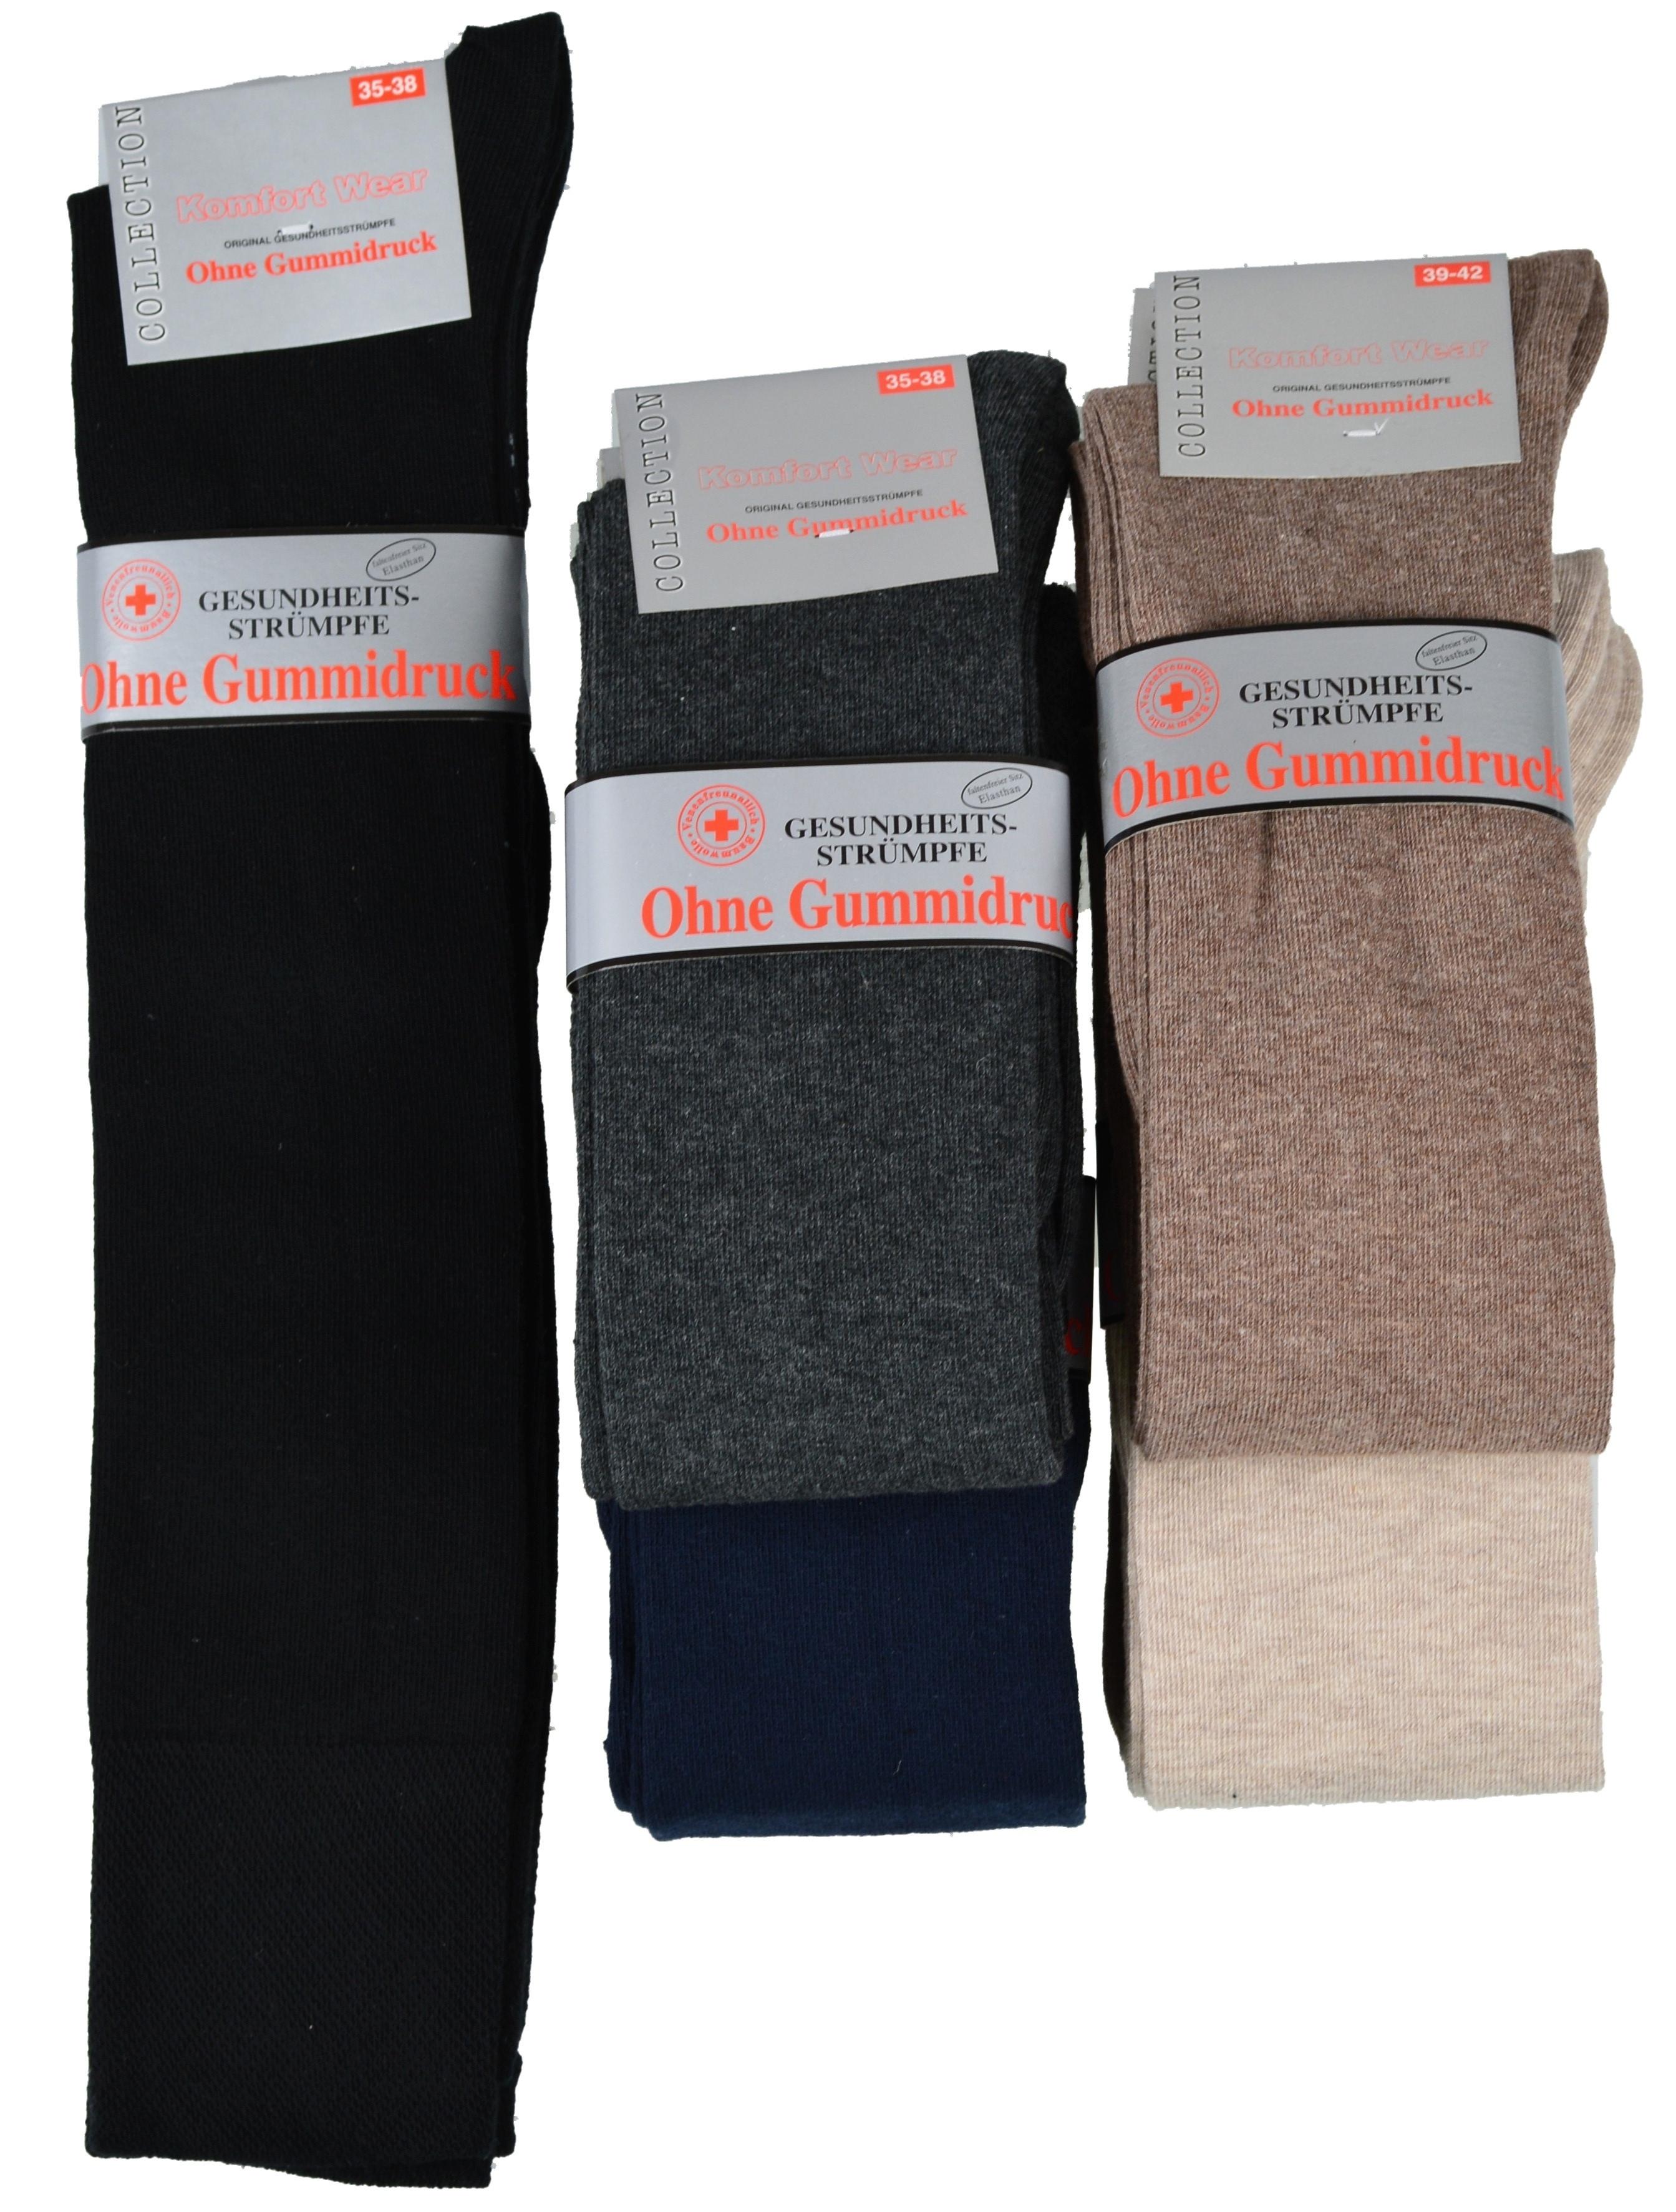 kniestr mpfe f r damen und herren die socke. Black Bedroom Furniture Sets. Home Design Ideas